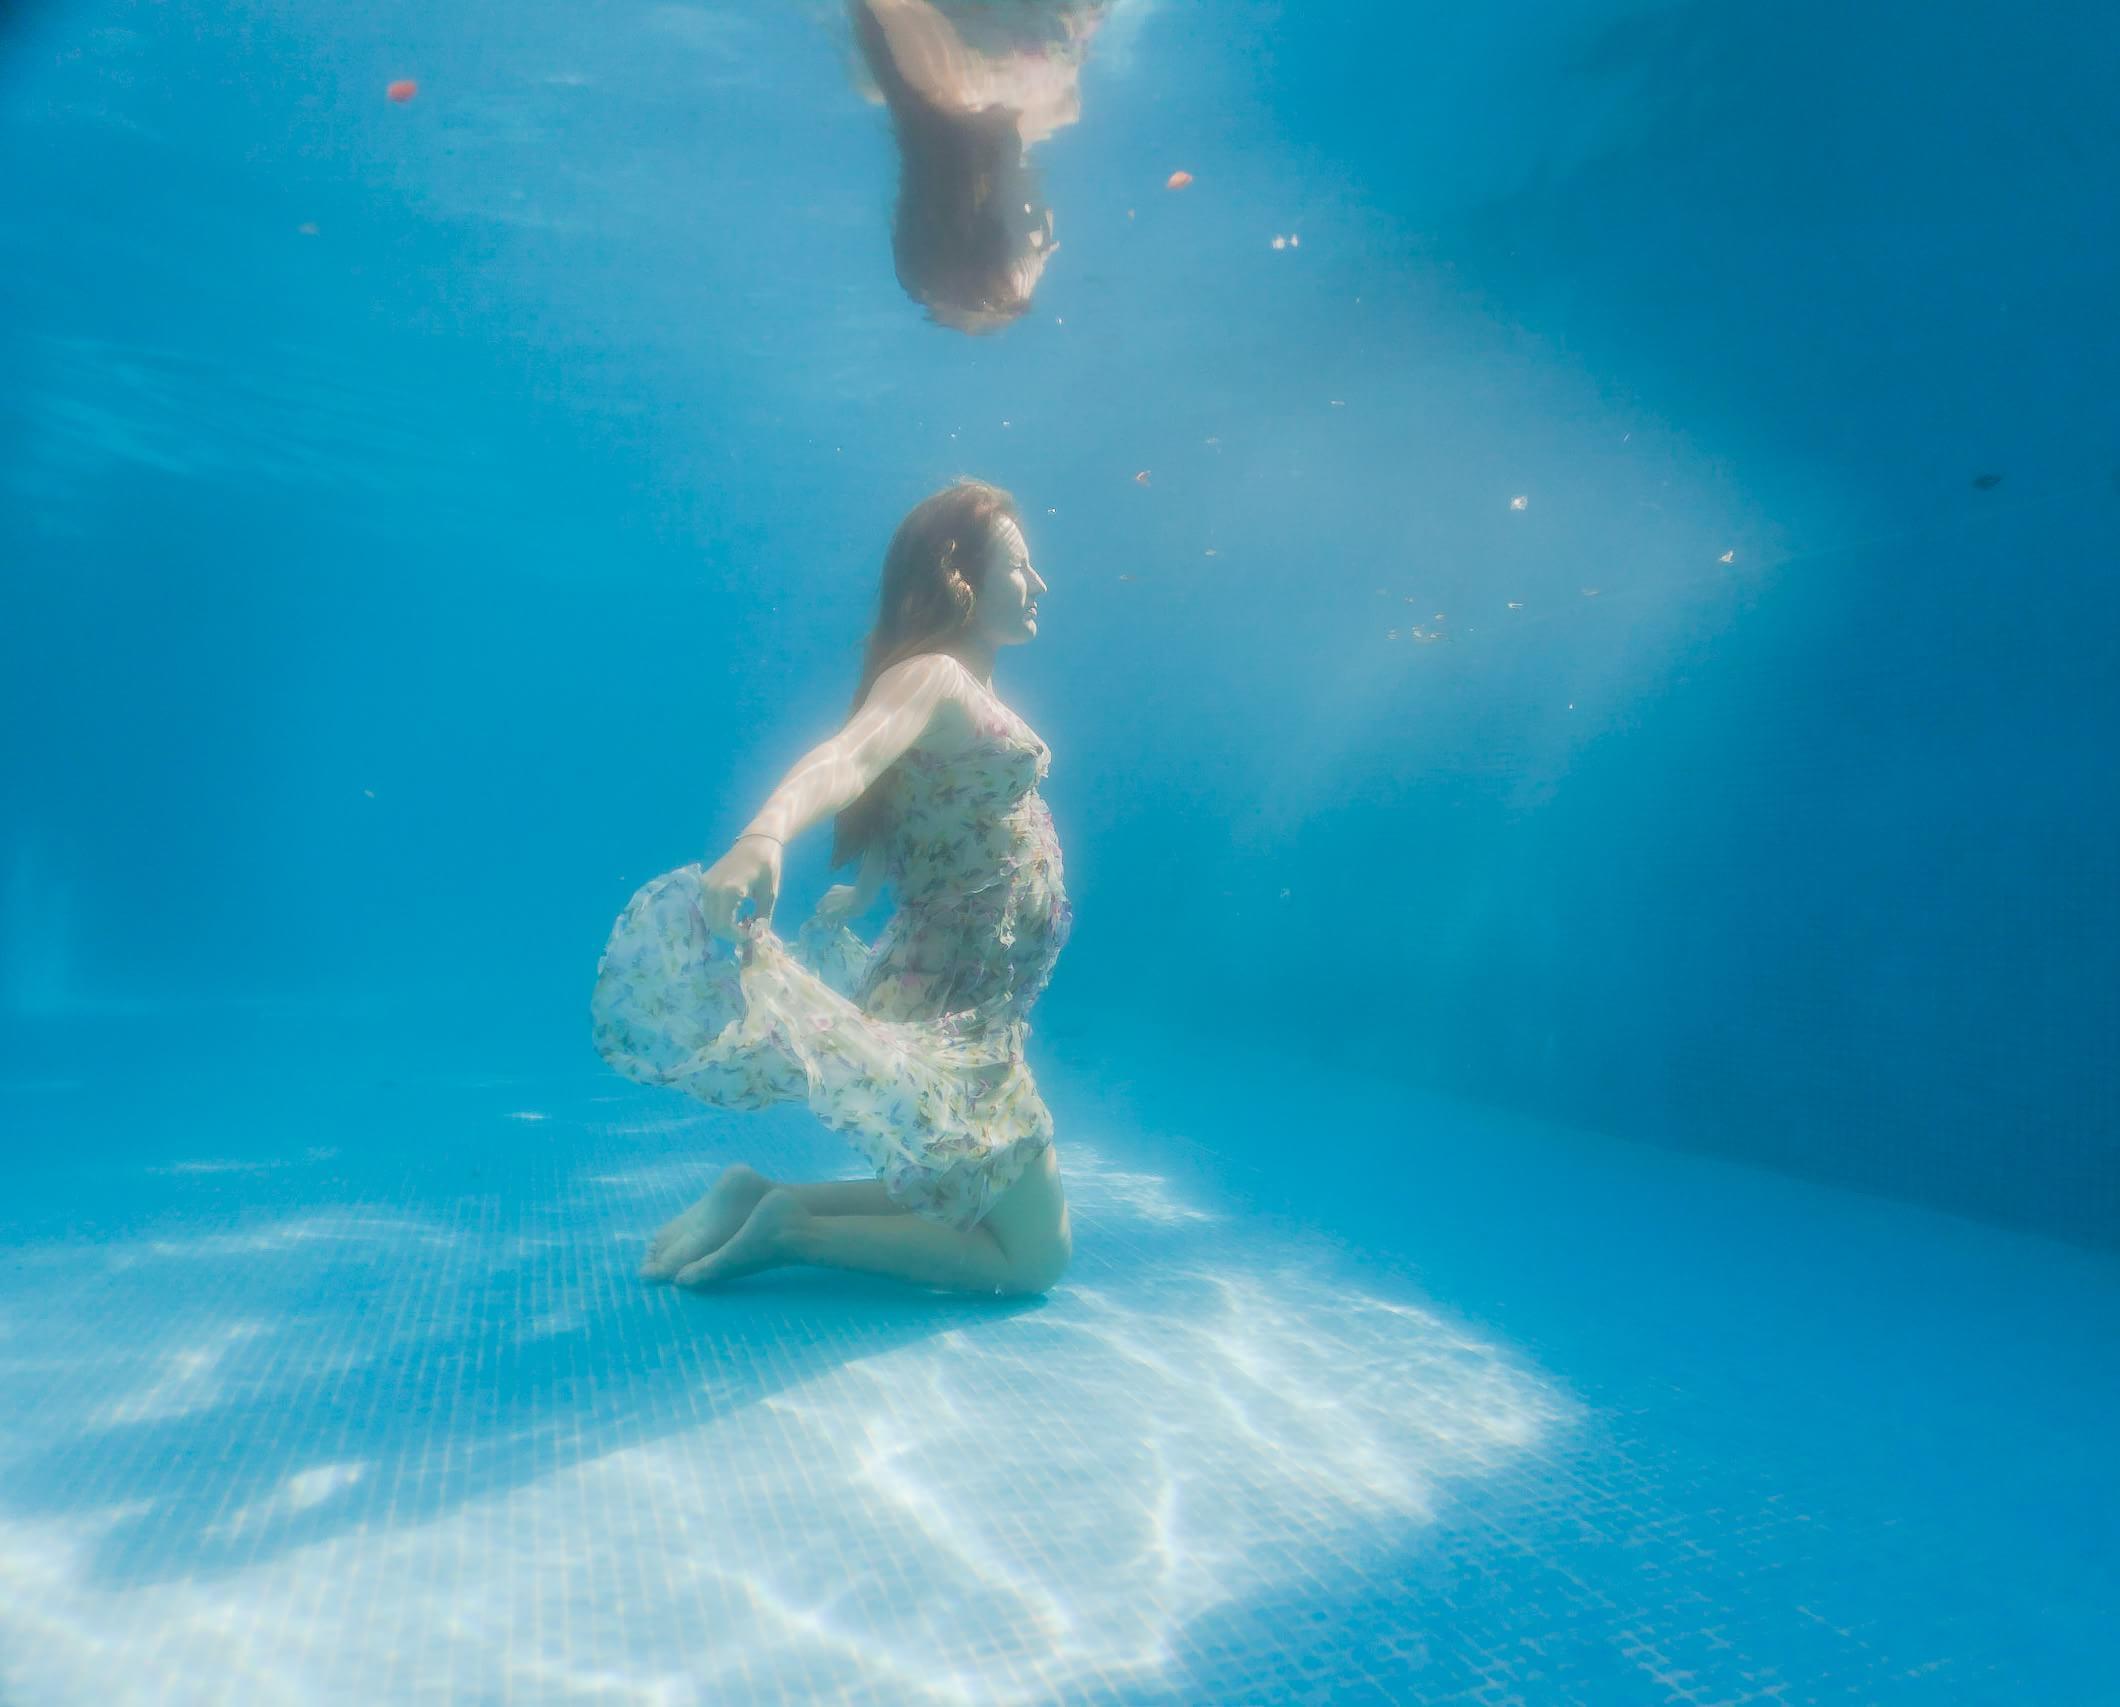 Pregnancy underwater image.